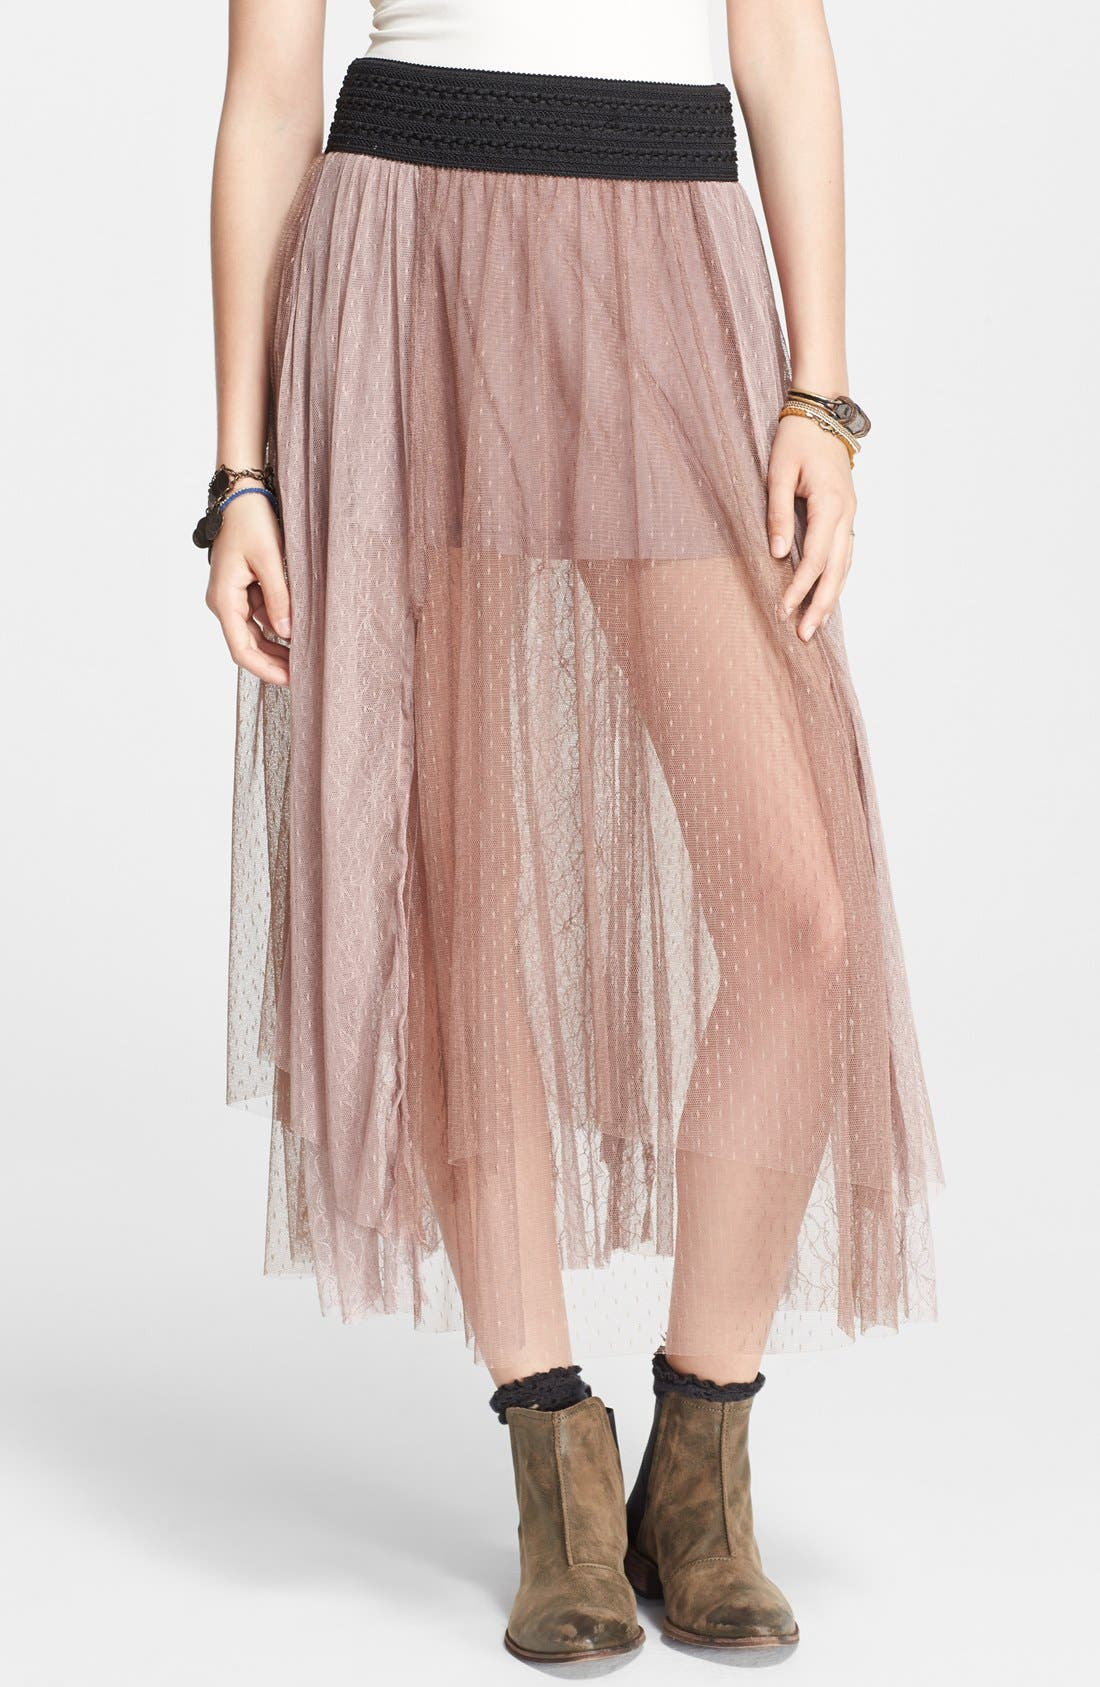 Alternate Image 1 Selected - Free People 'Sugar Plum' Tutu Skirt